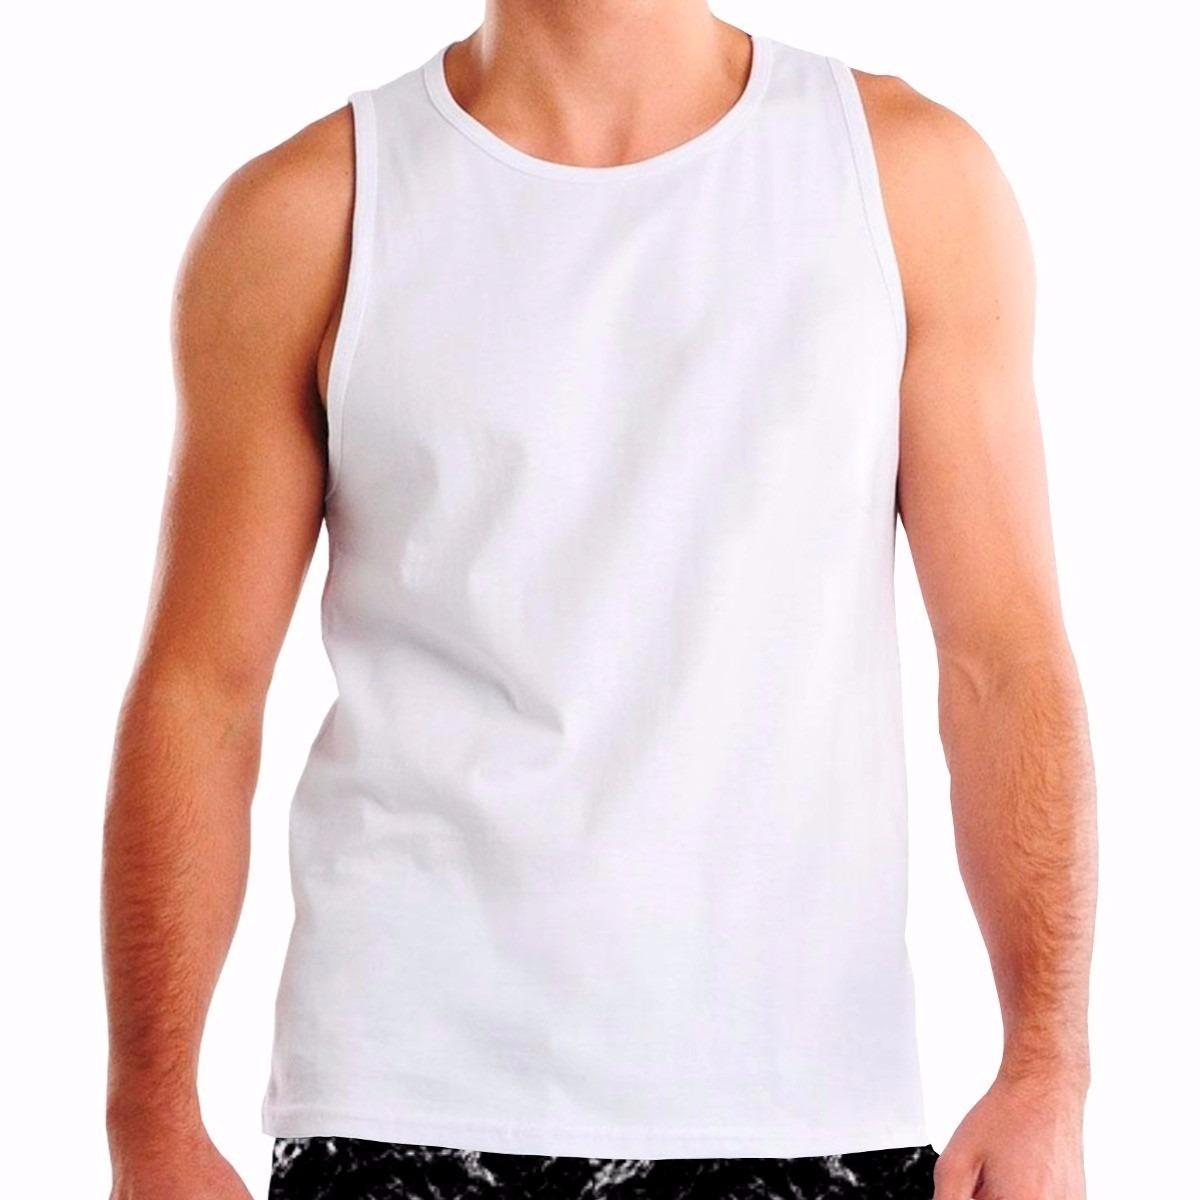 ee1afb8e9 regata masculina branca 100% polyester sublimaçao barata. Carregando zoom.